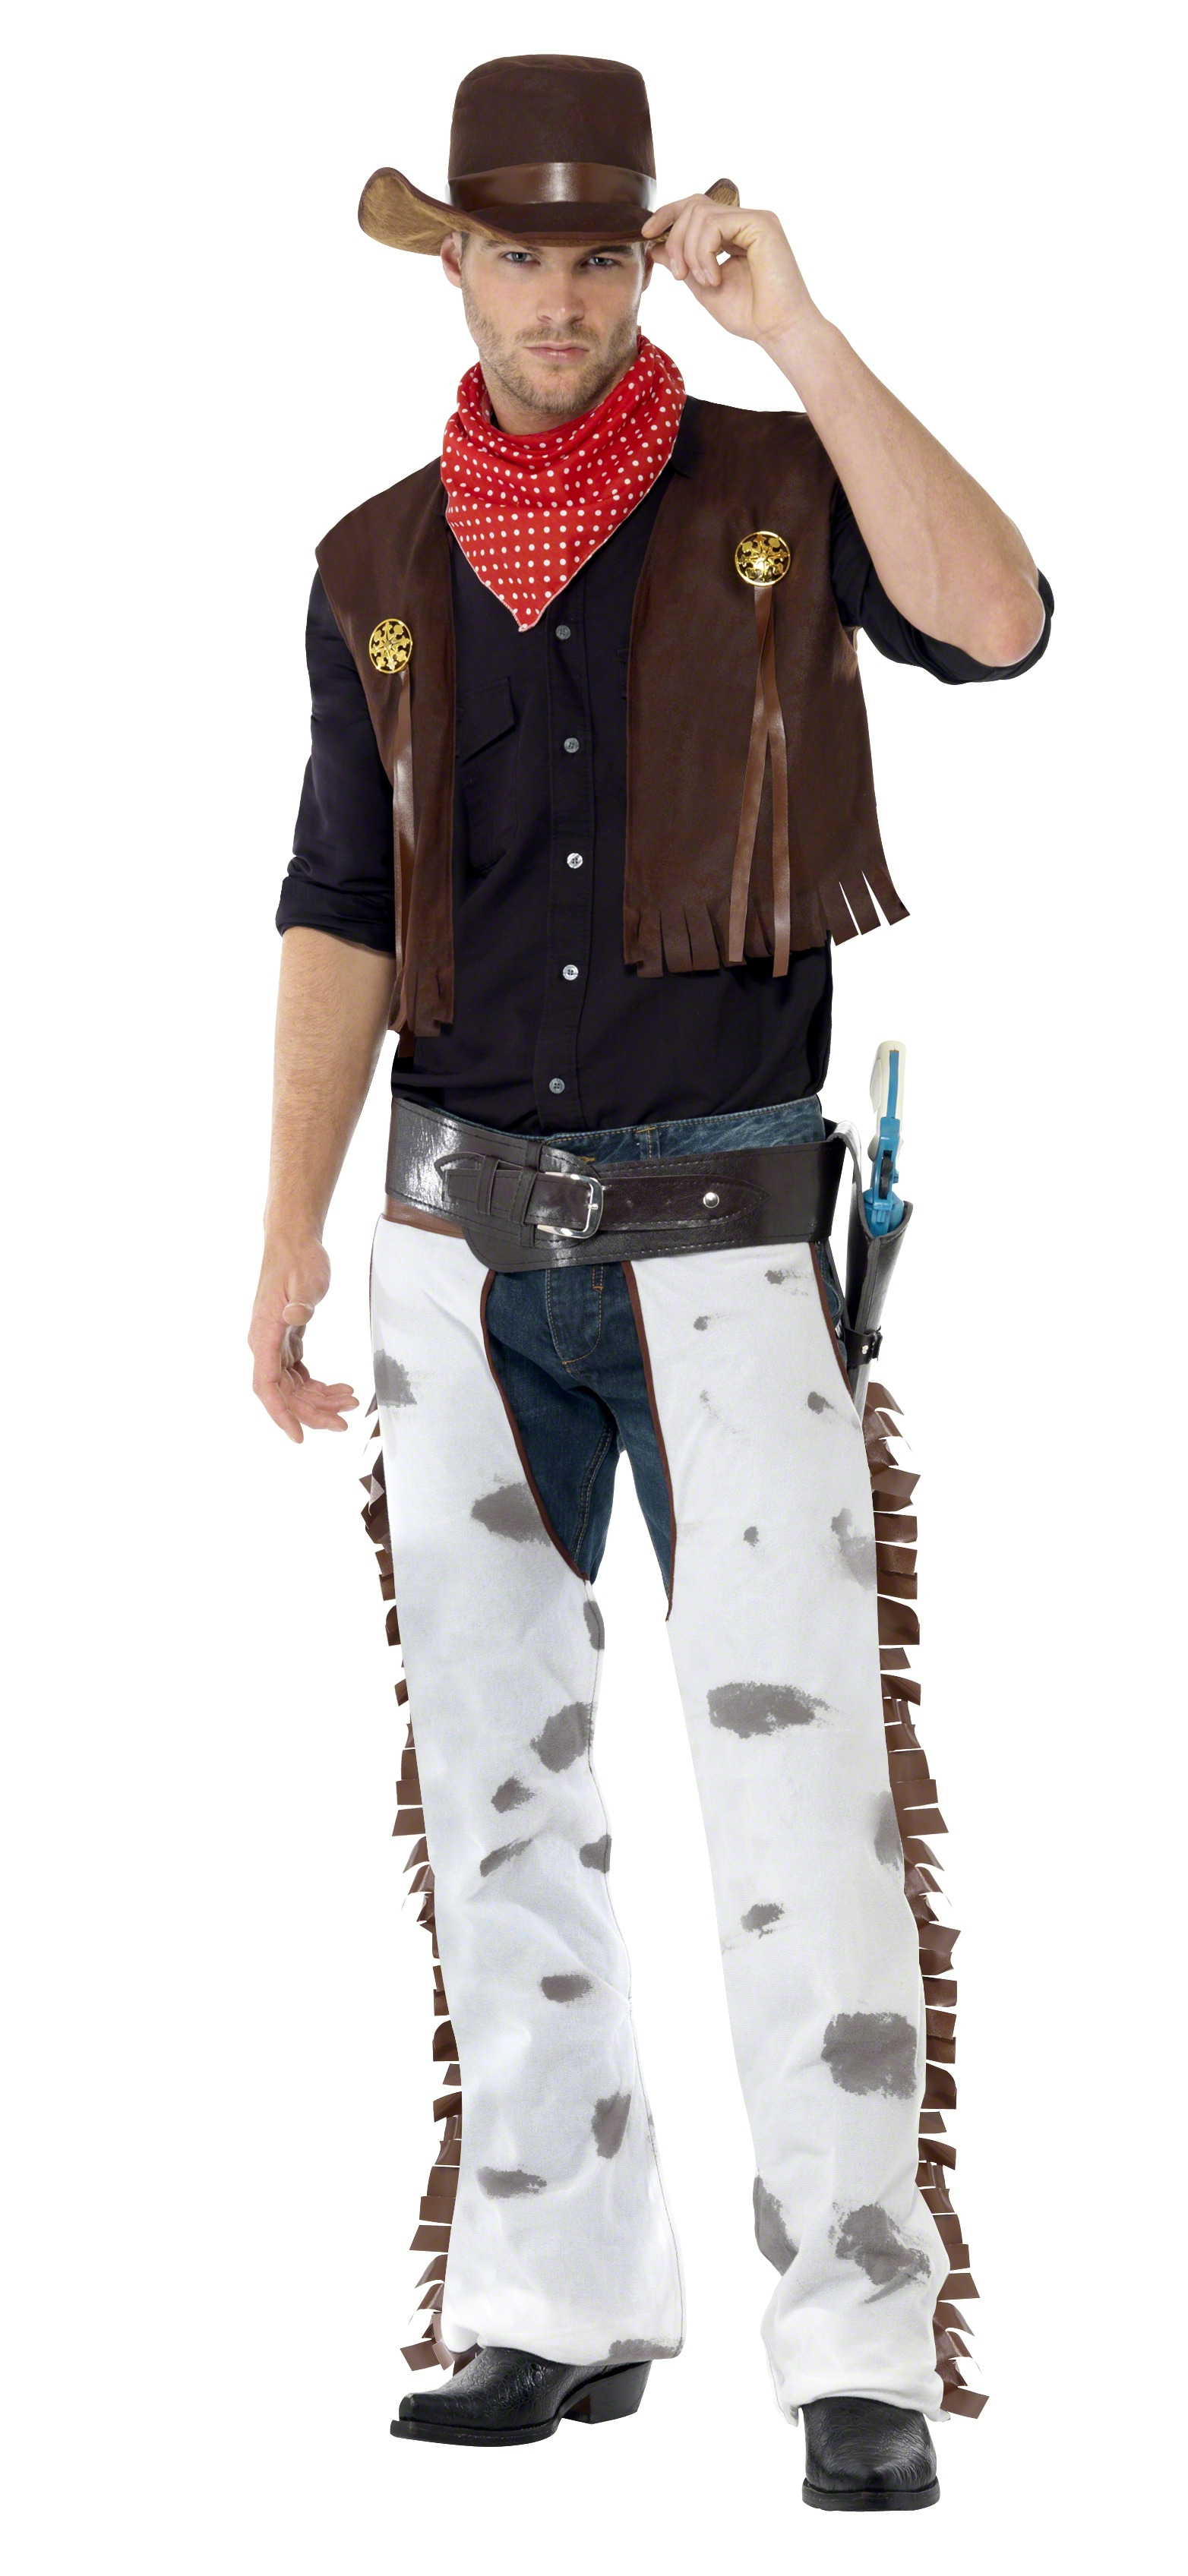 Guy Cowboy Costumes Cowboy-costume-mens-western